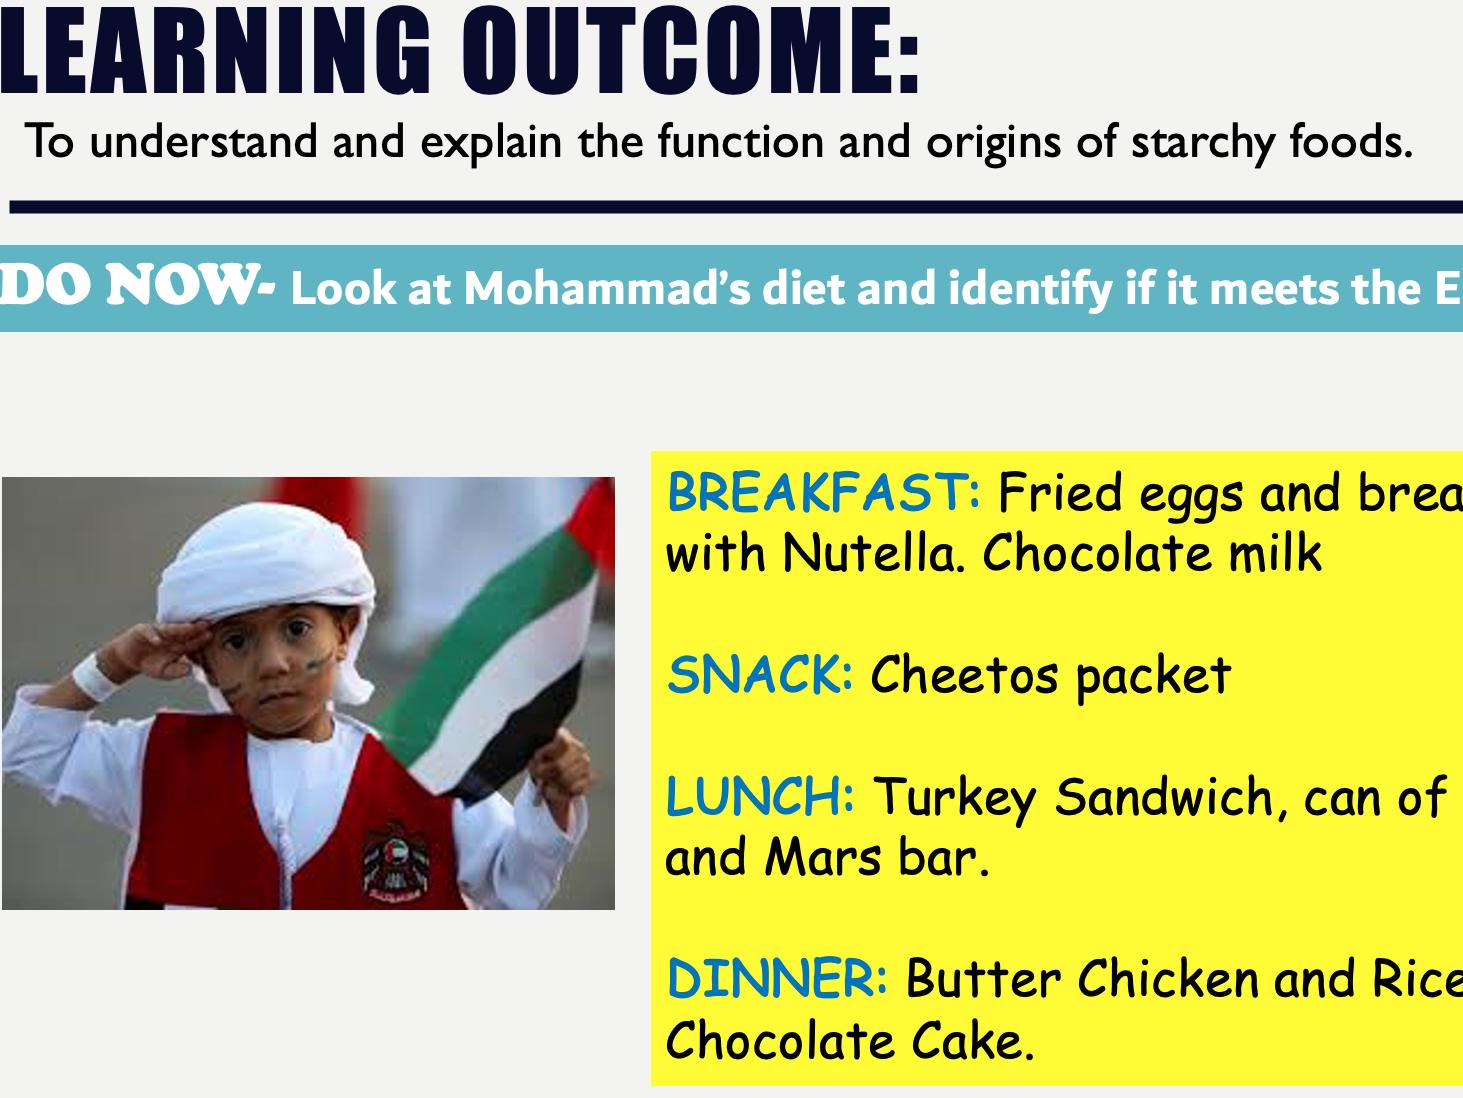 KS3 Food and Nutrition - 9 Lesson Bundle